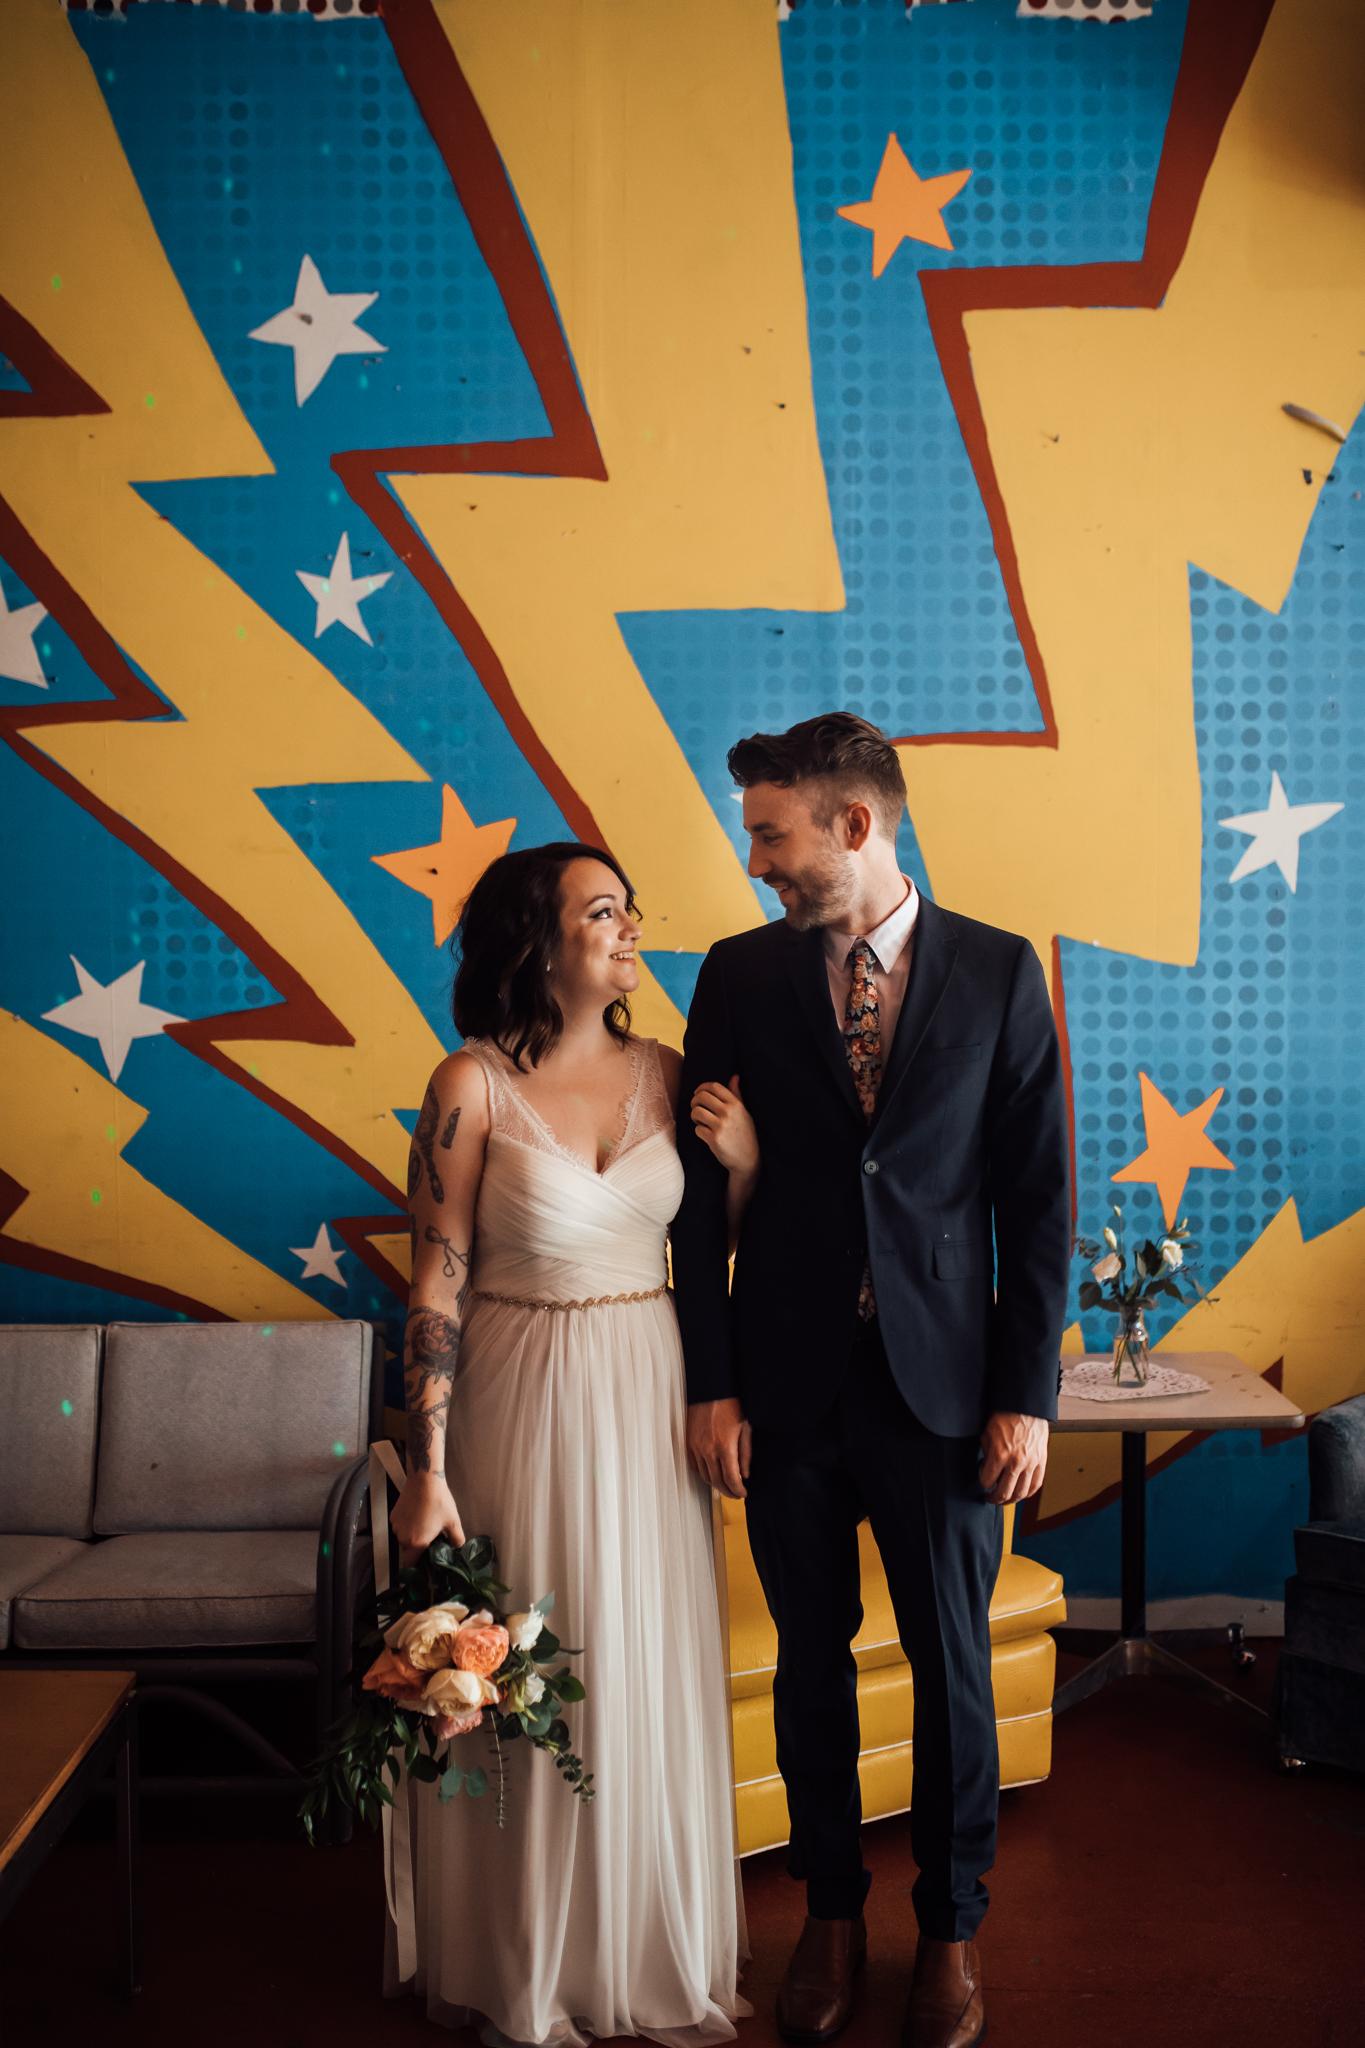 thewarmtharoundyou-amurica-studio-wedding-colorful-unique-wedding (25 of 47).jpg